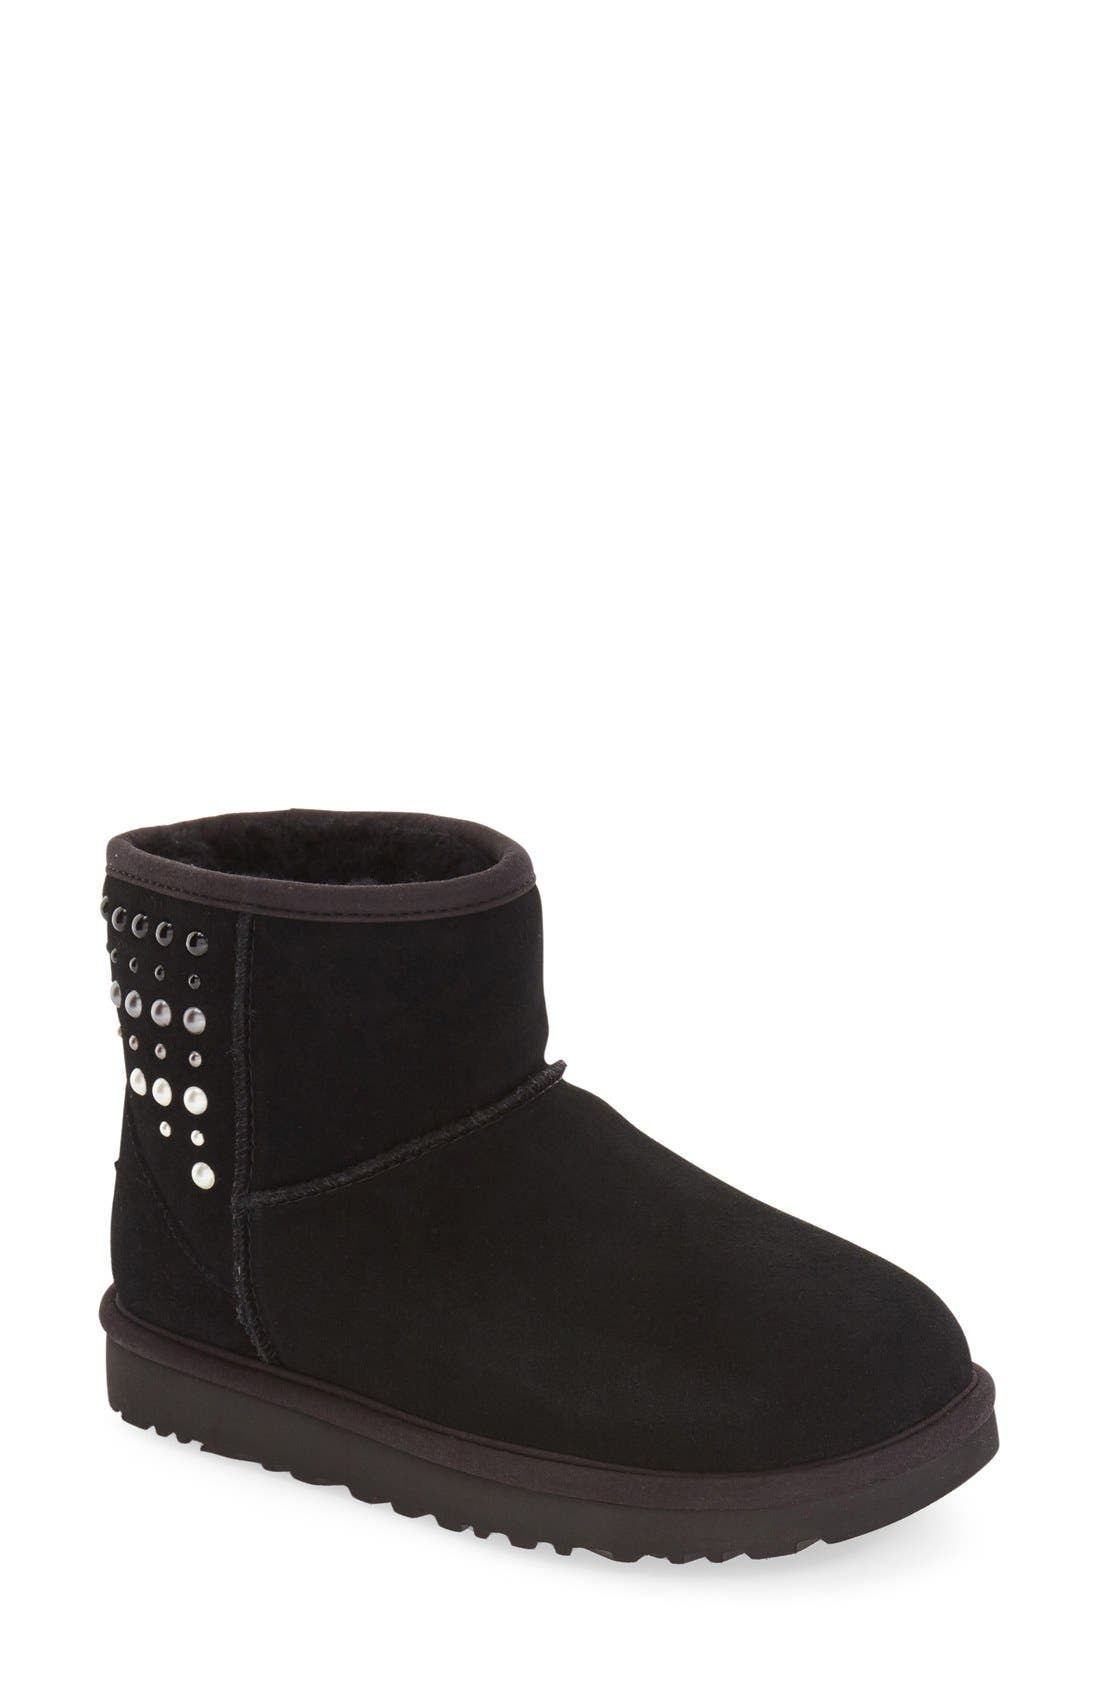 'Mini Classic - Pearls' Boot, Main, color, 001